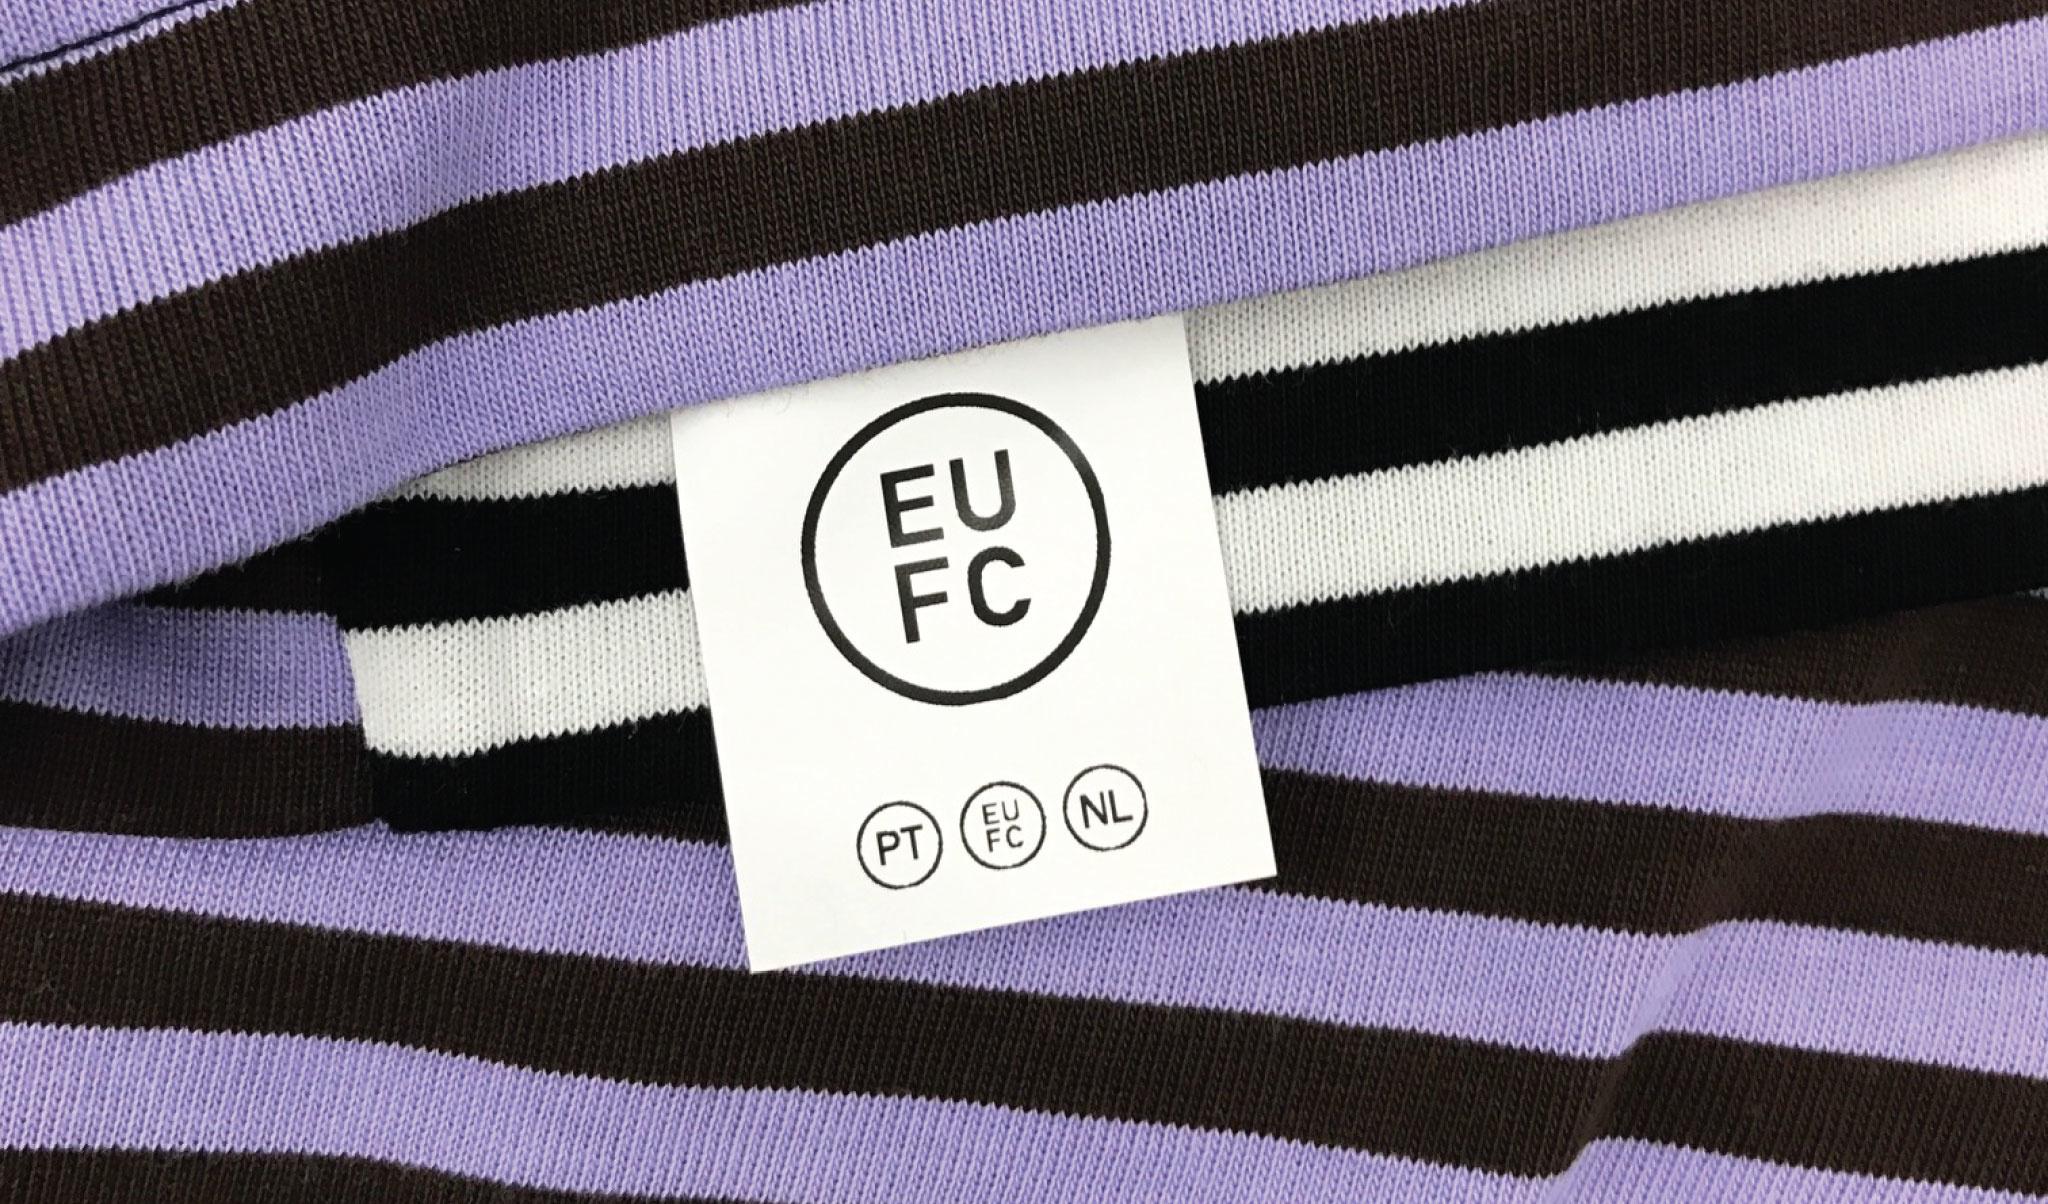 LIVE: EU FC - Exclusief bij FRESHCOTTON